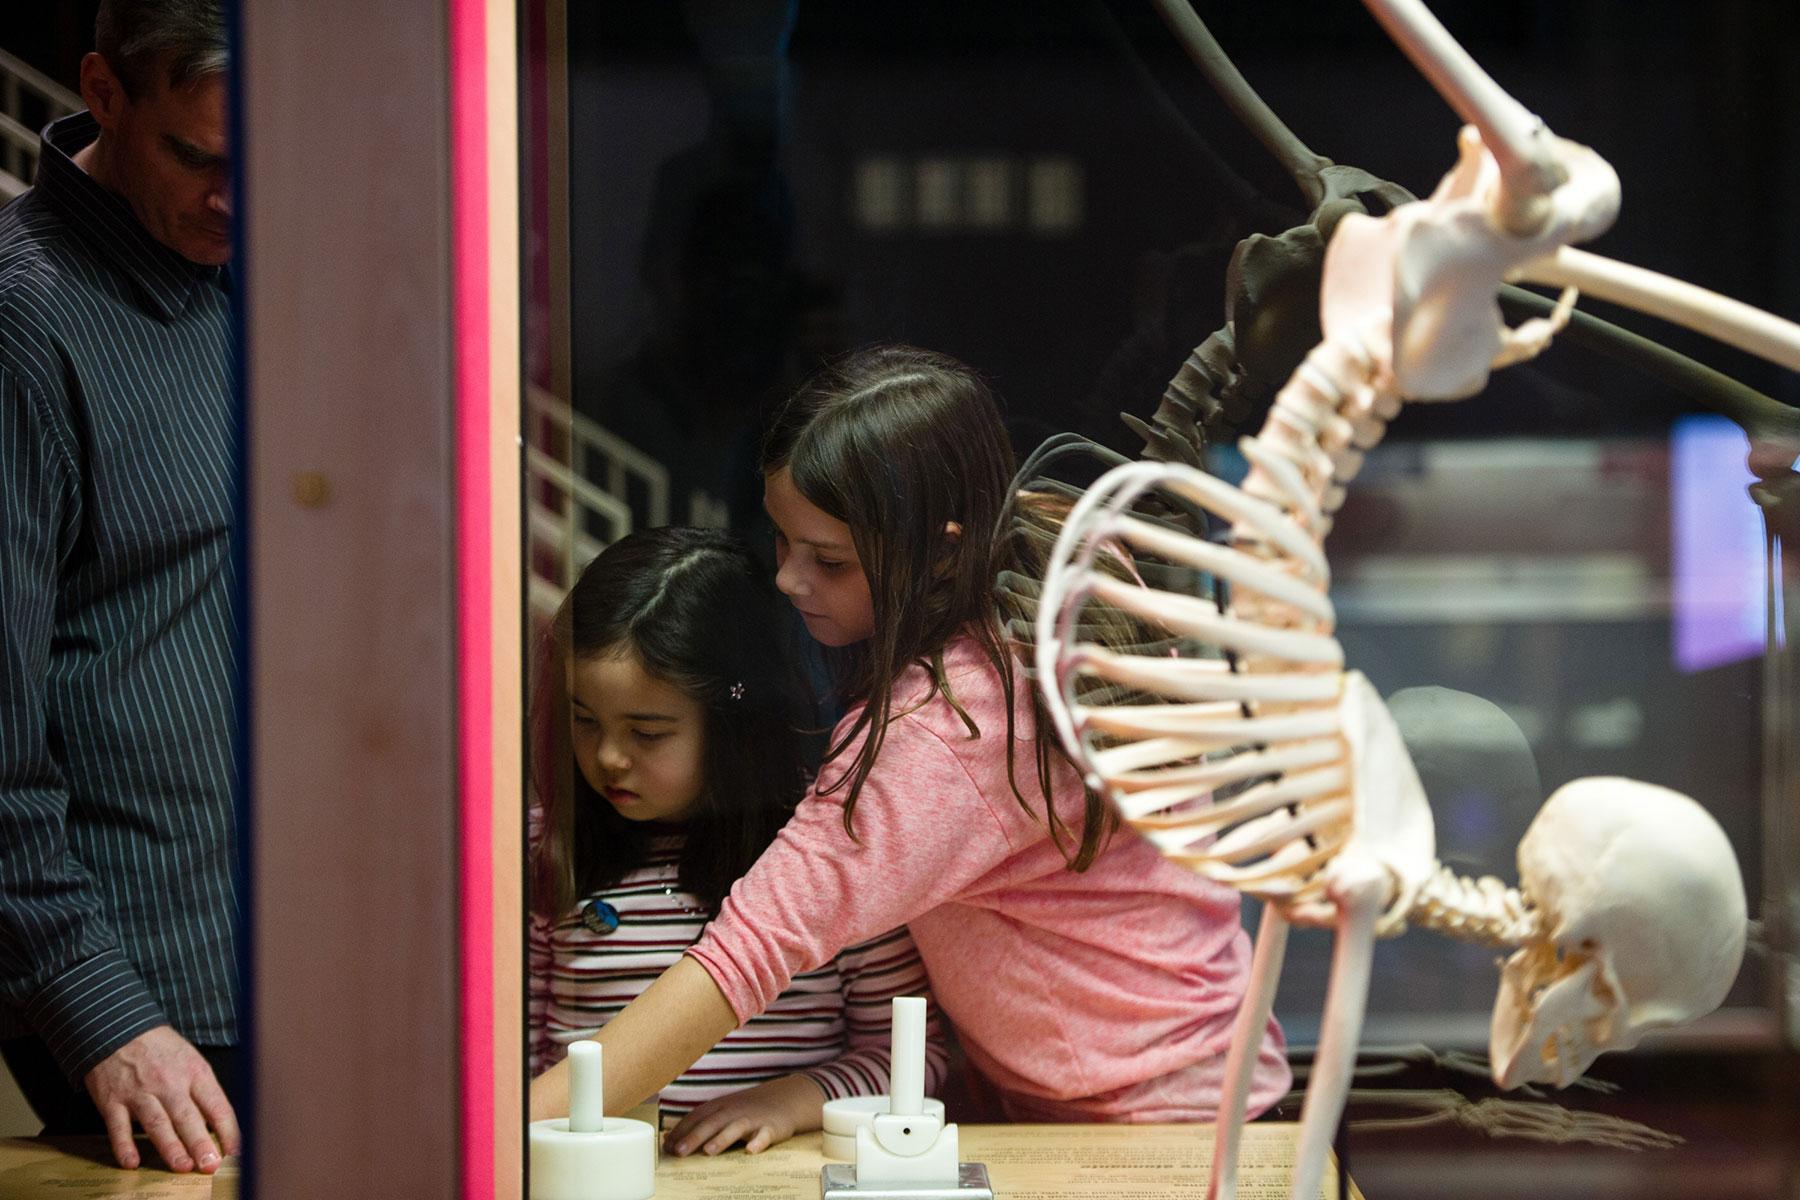 Children interacting with the exhibit